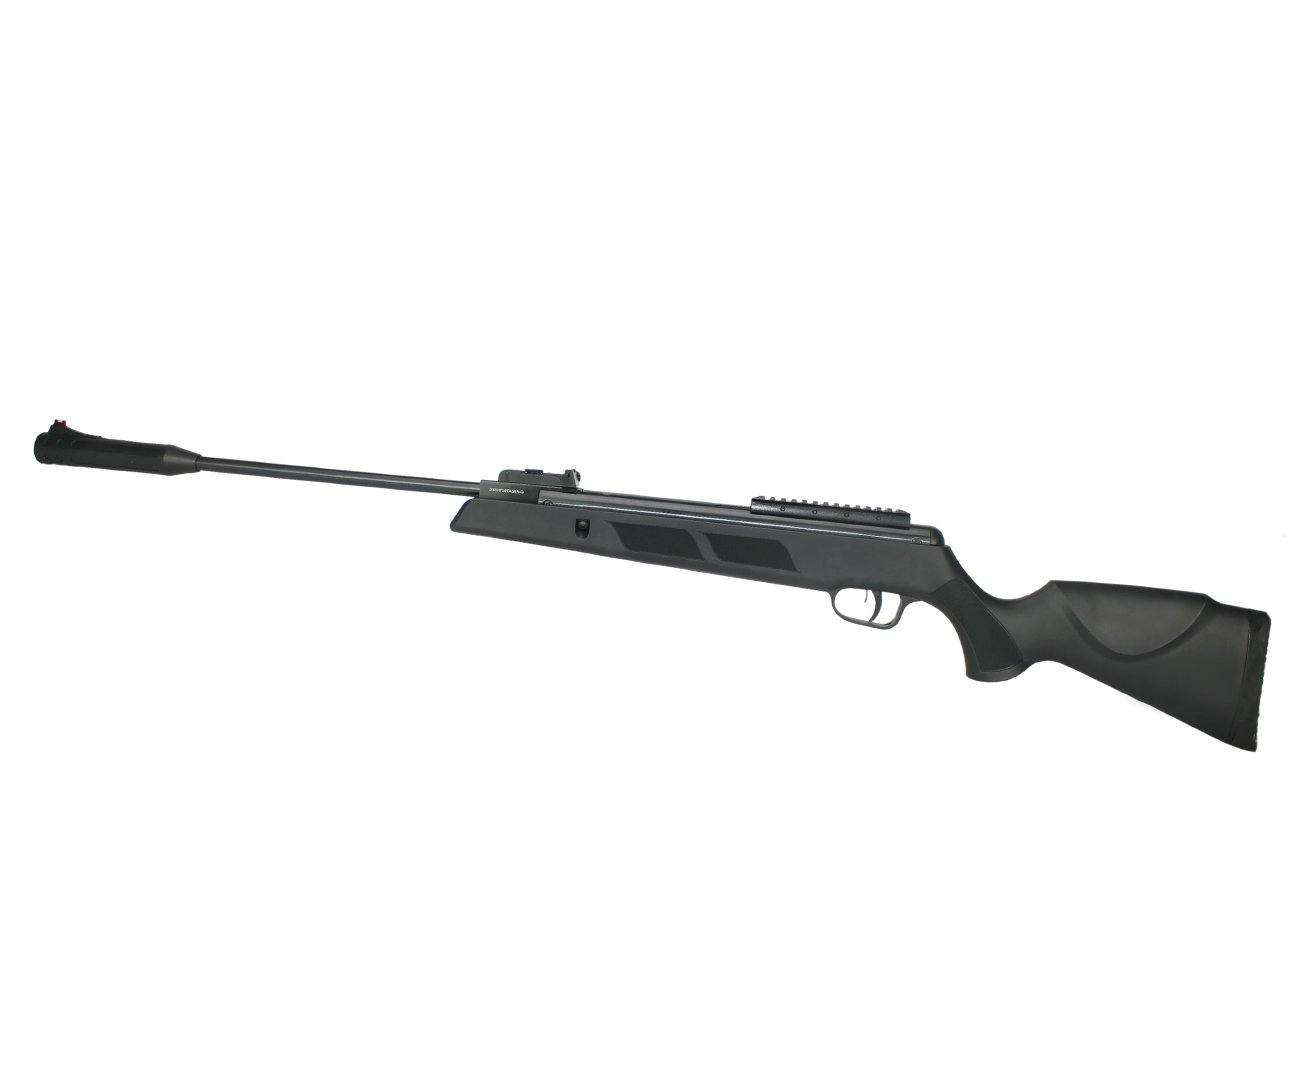 Carabina De Pressão Black Hawk 5.5mm Artemis